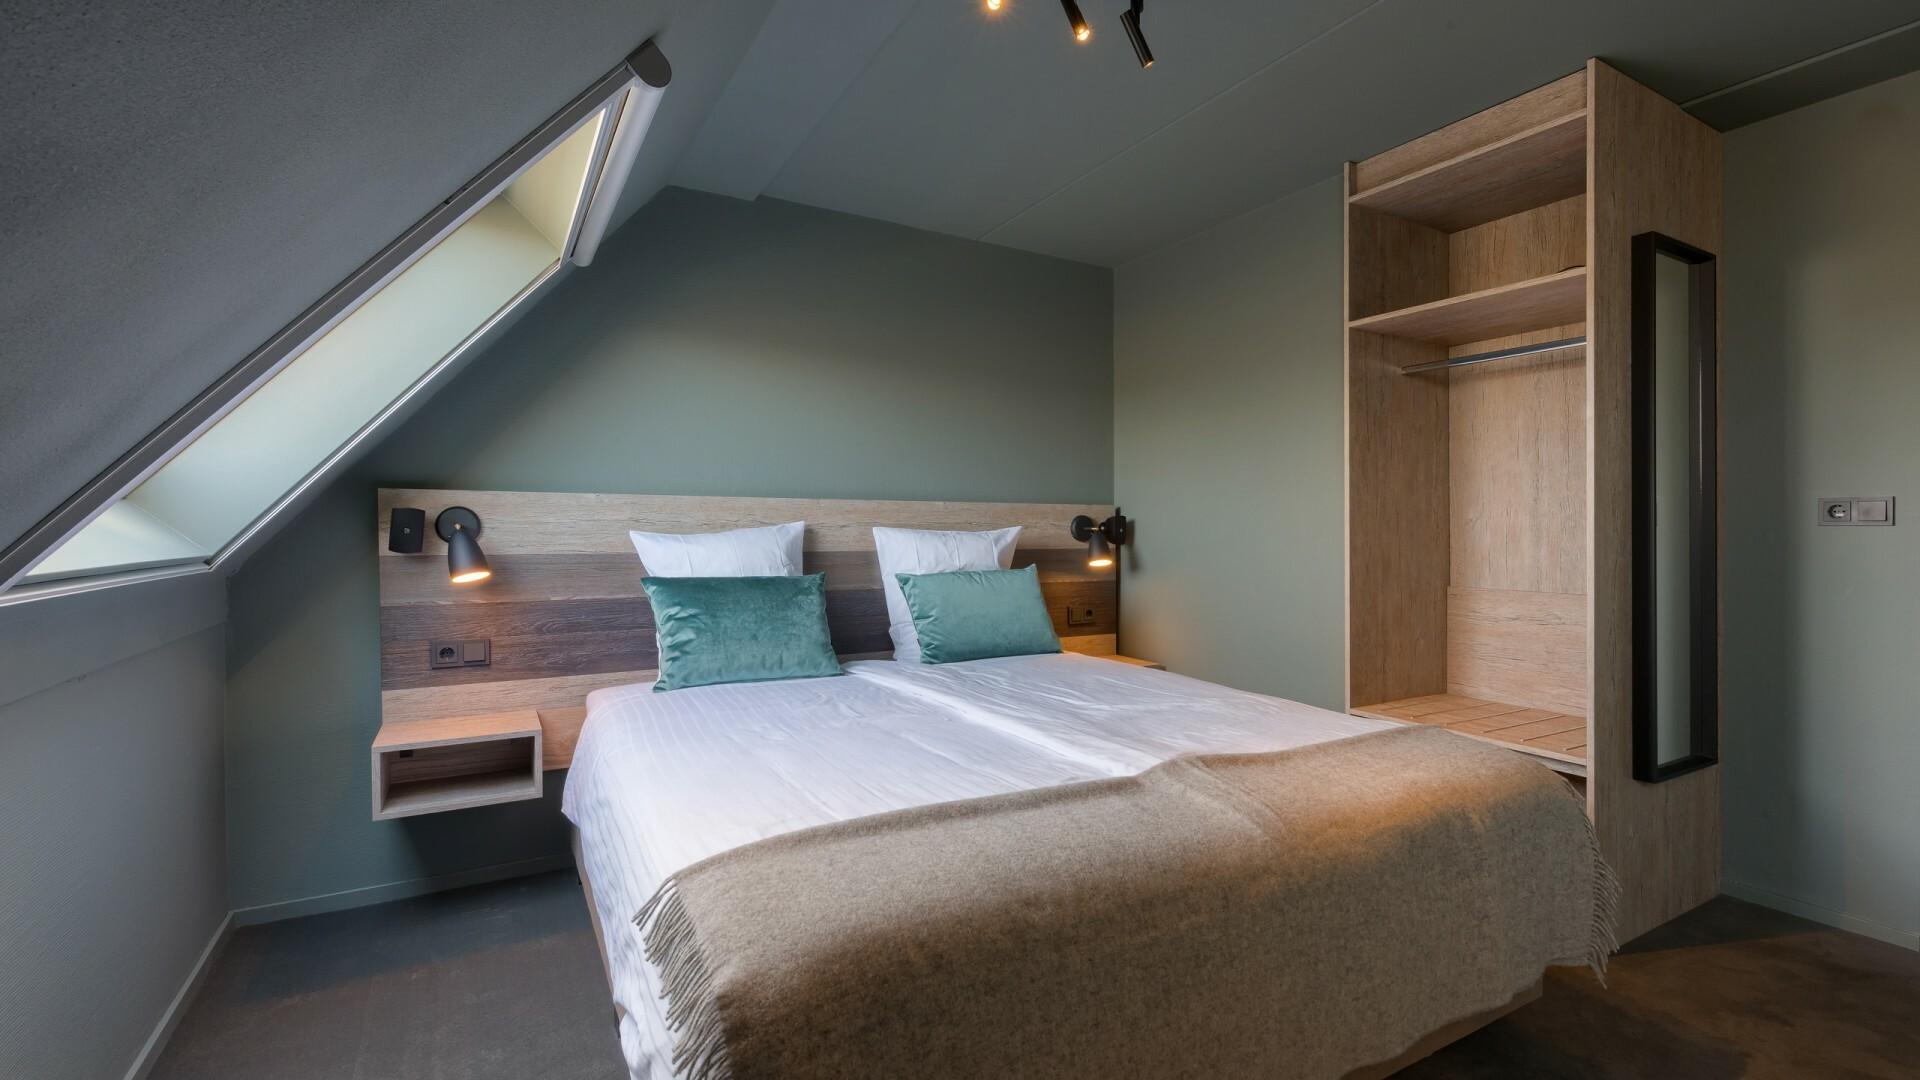 Hotelkamer Hotel Prins Hendrik VVV Texel